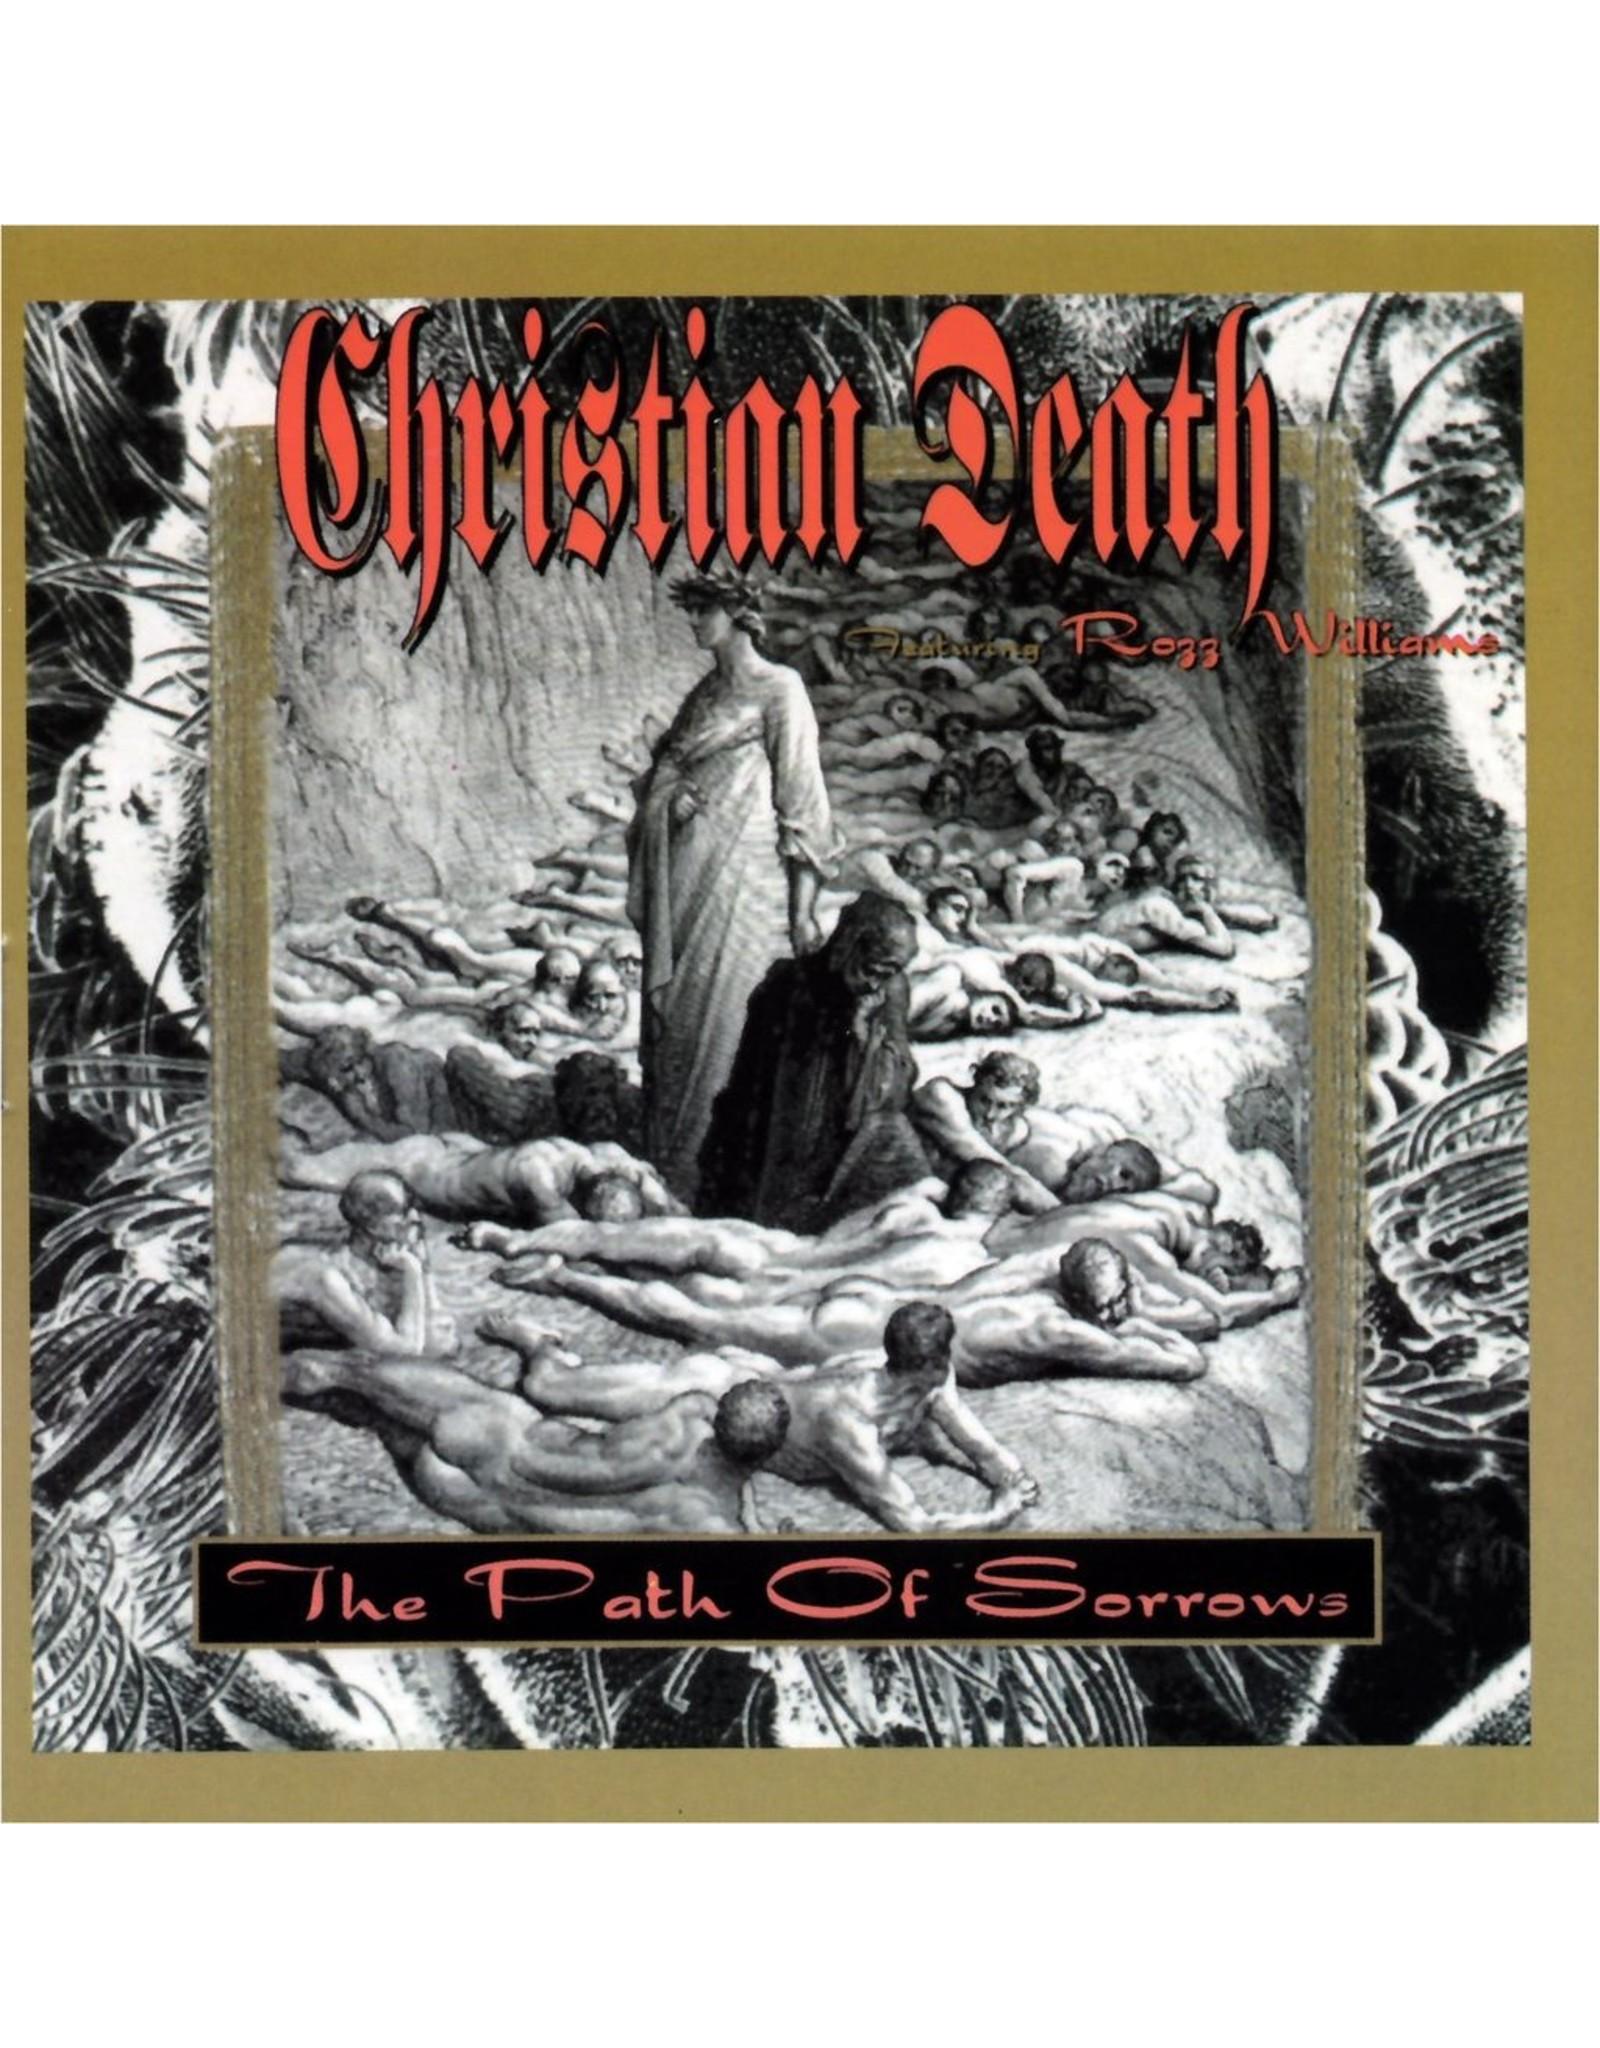 New Vinyl Christian Death - The Path Of Sorrows LP